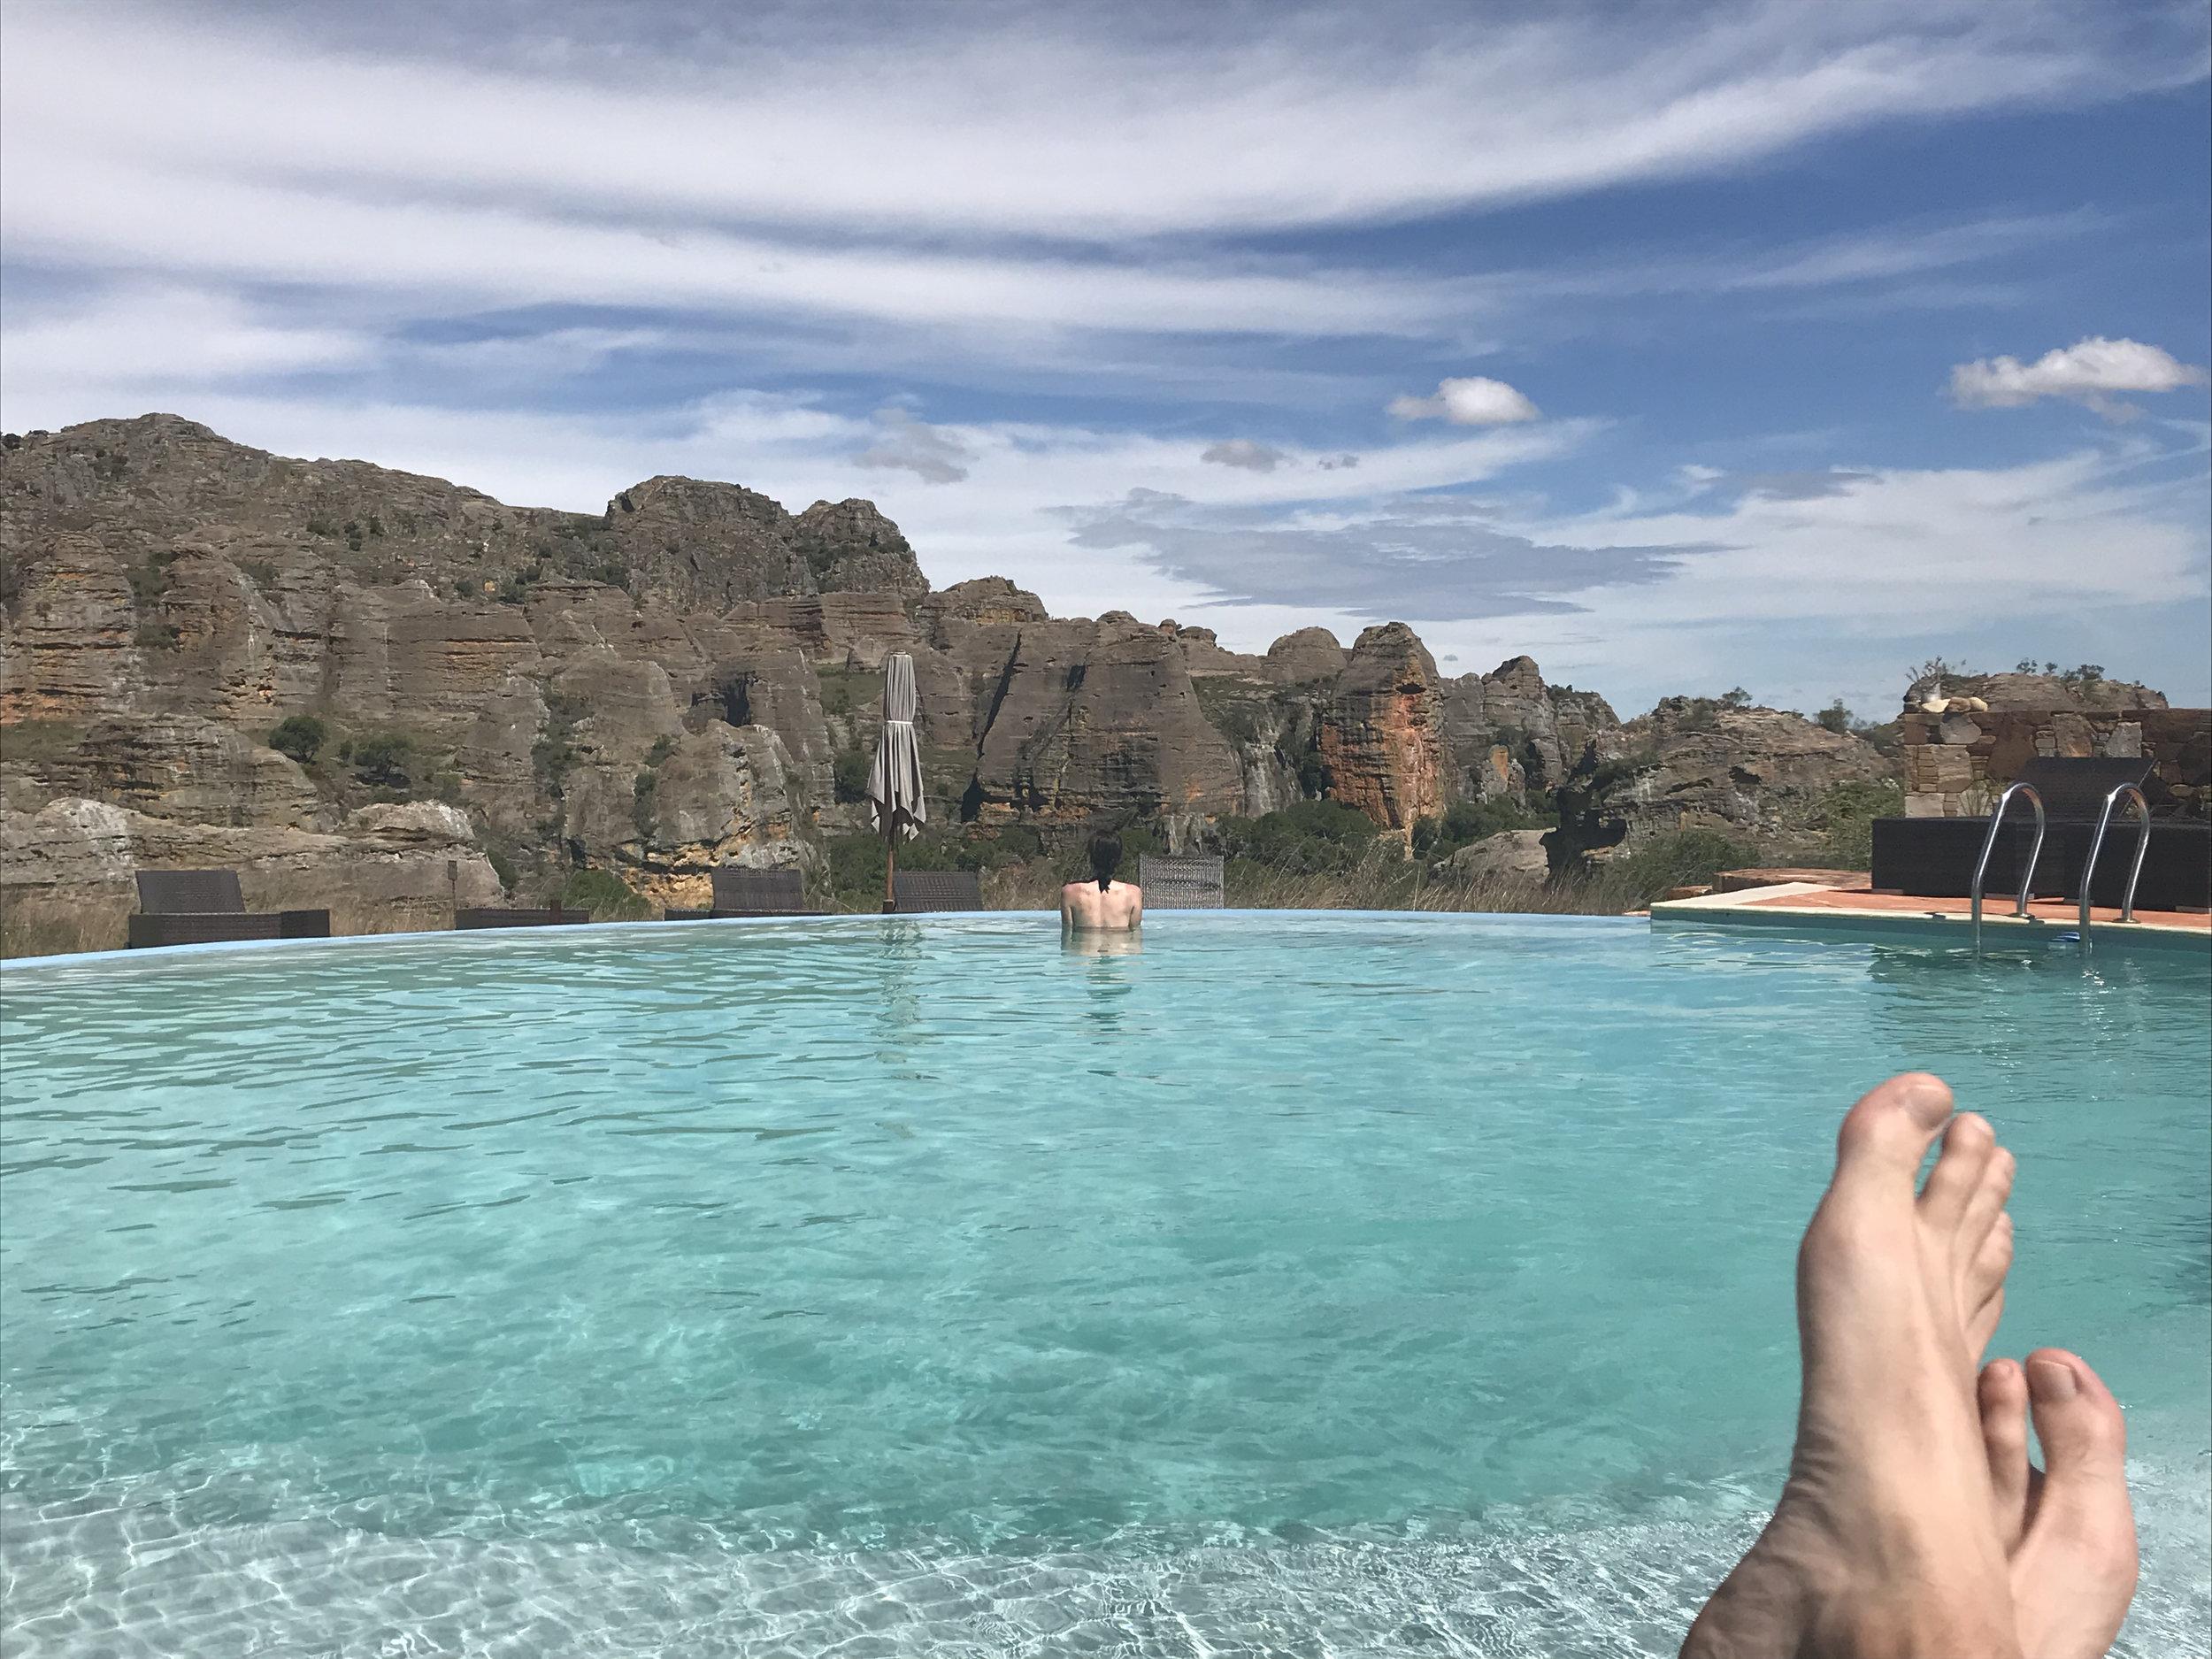 nice spot for a swim